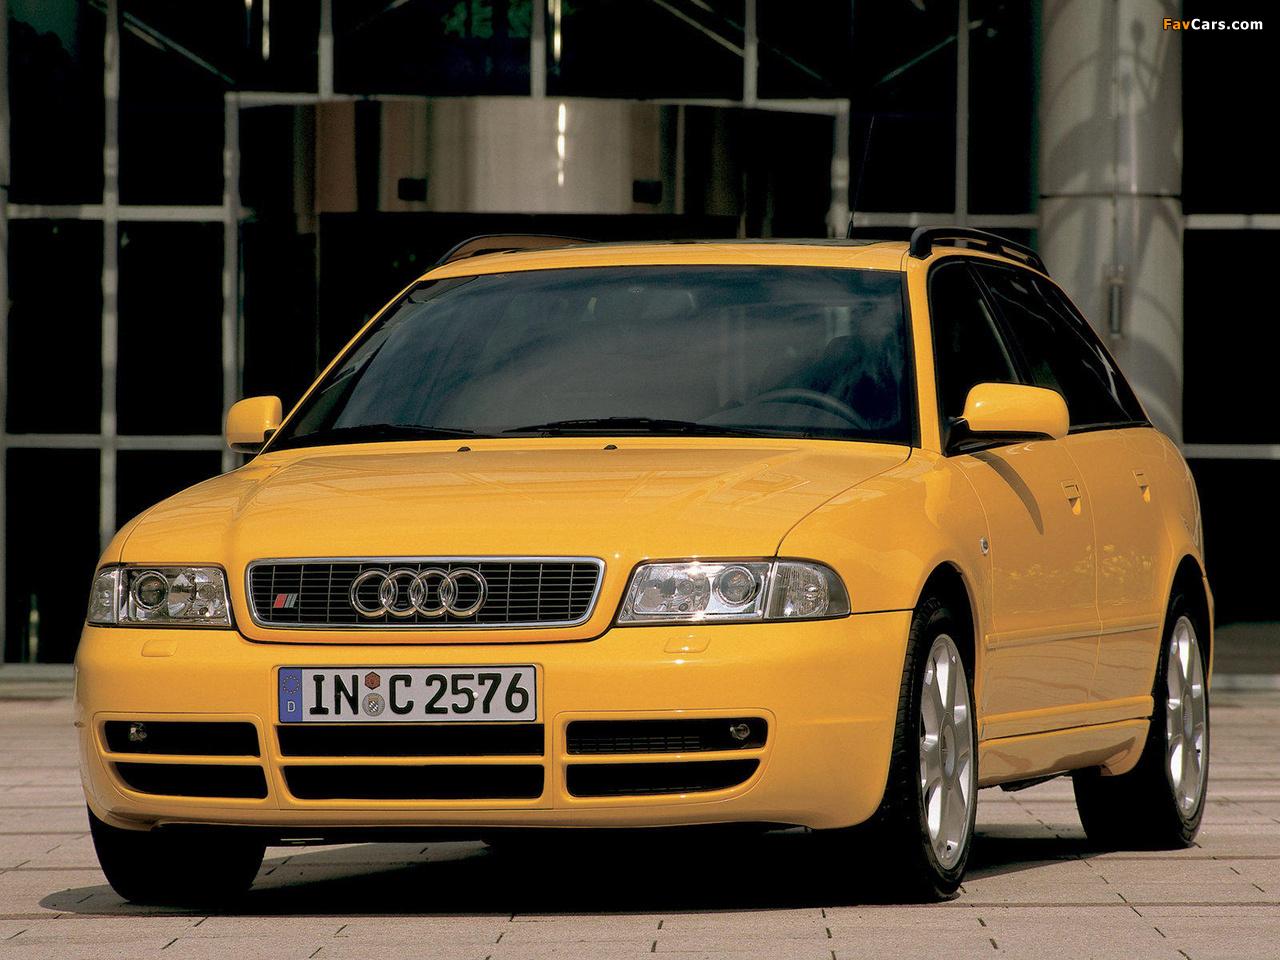 Audi S4 Avant (B5,8D) 1997-2002 wallpapers (1280x960)